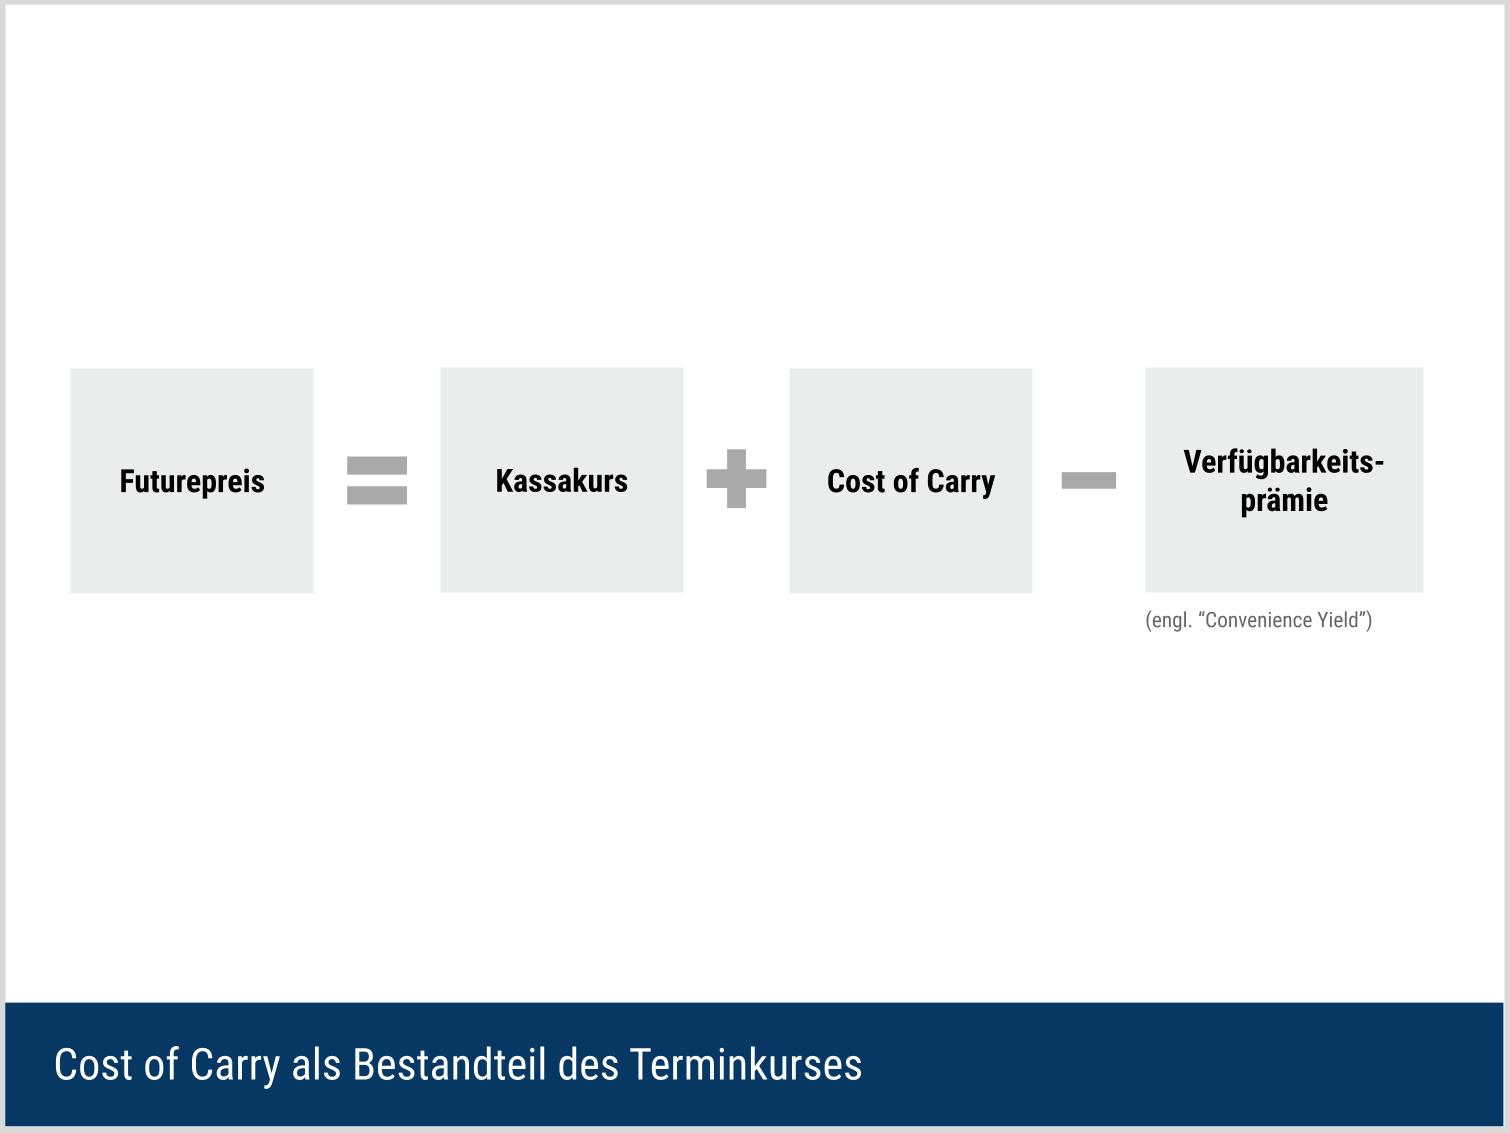 Cost of Carry als Bestandteil des Future-Preises